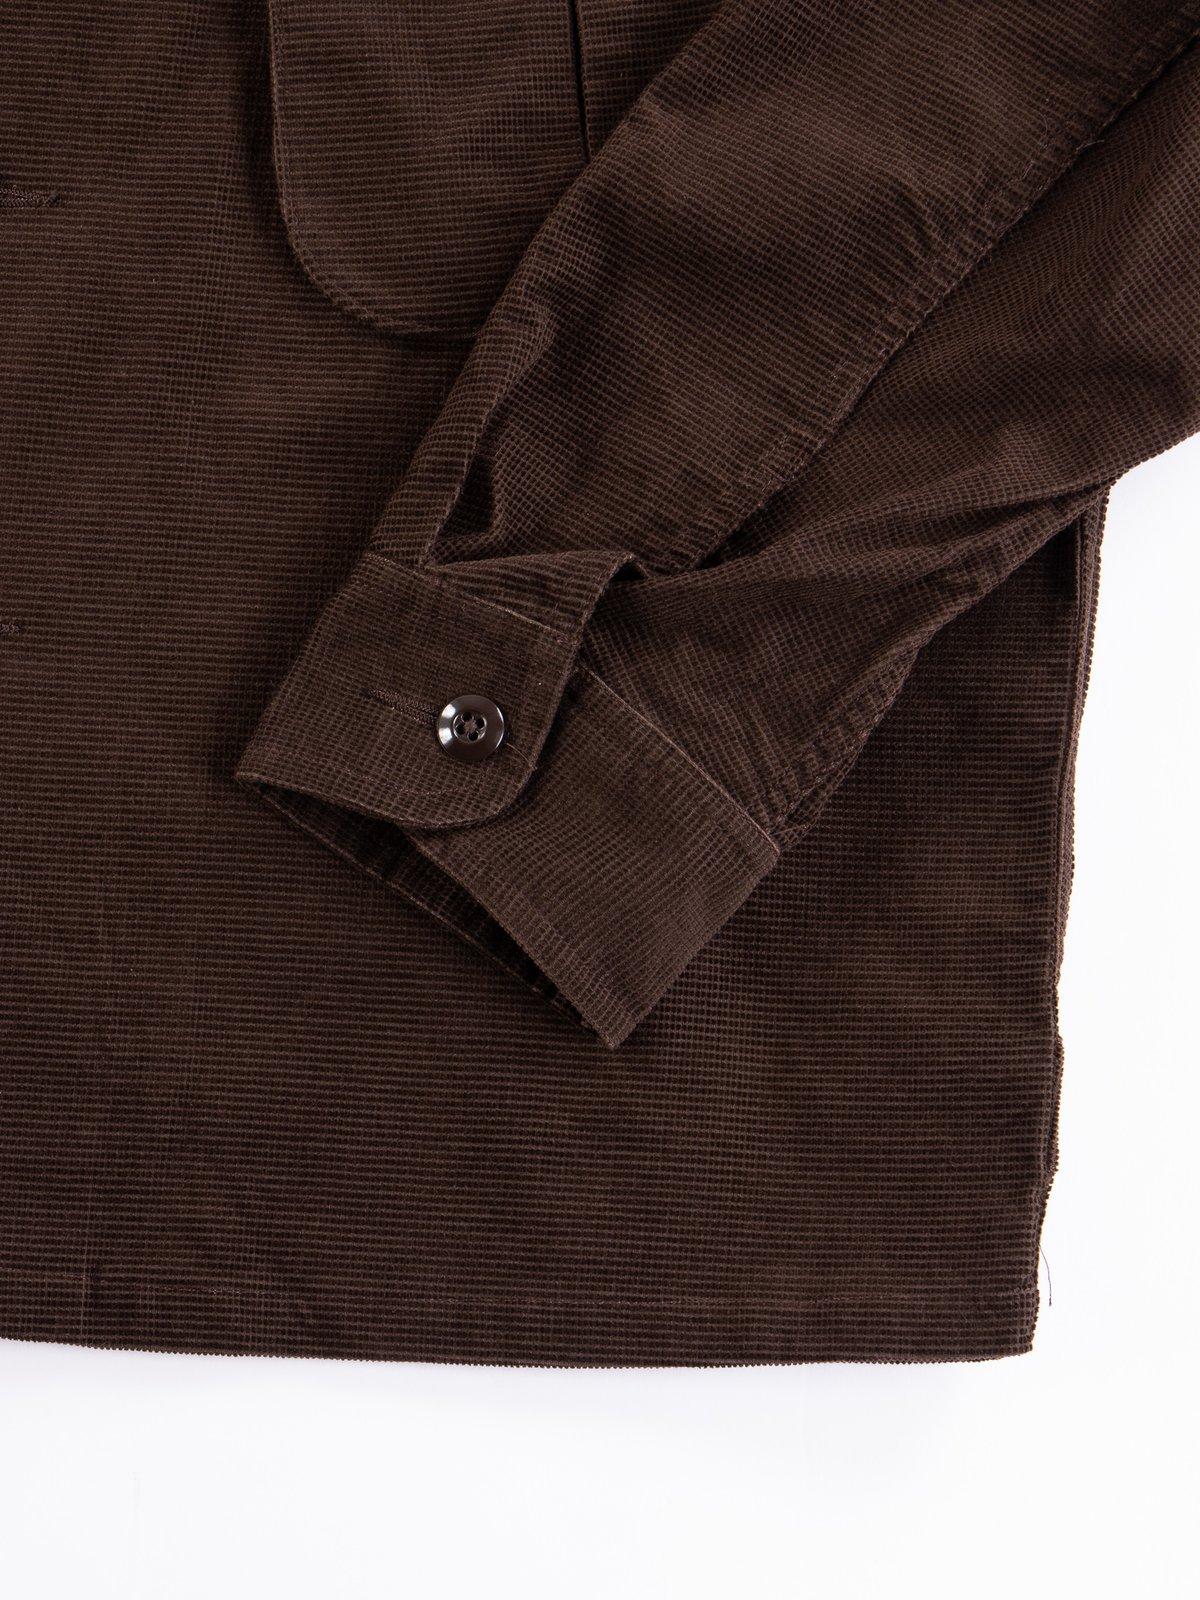 Dark Brown Dobby Caramel Corduroy Combat Short Jacket - Image 5